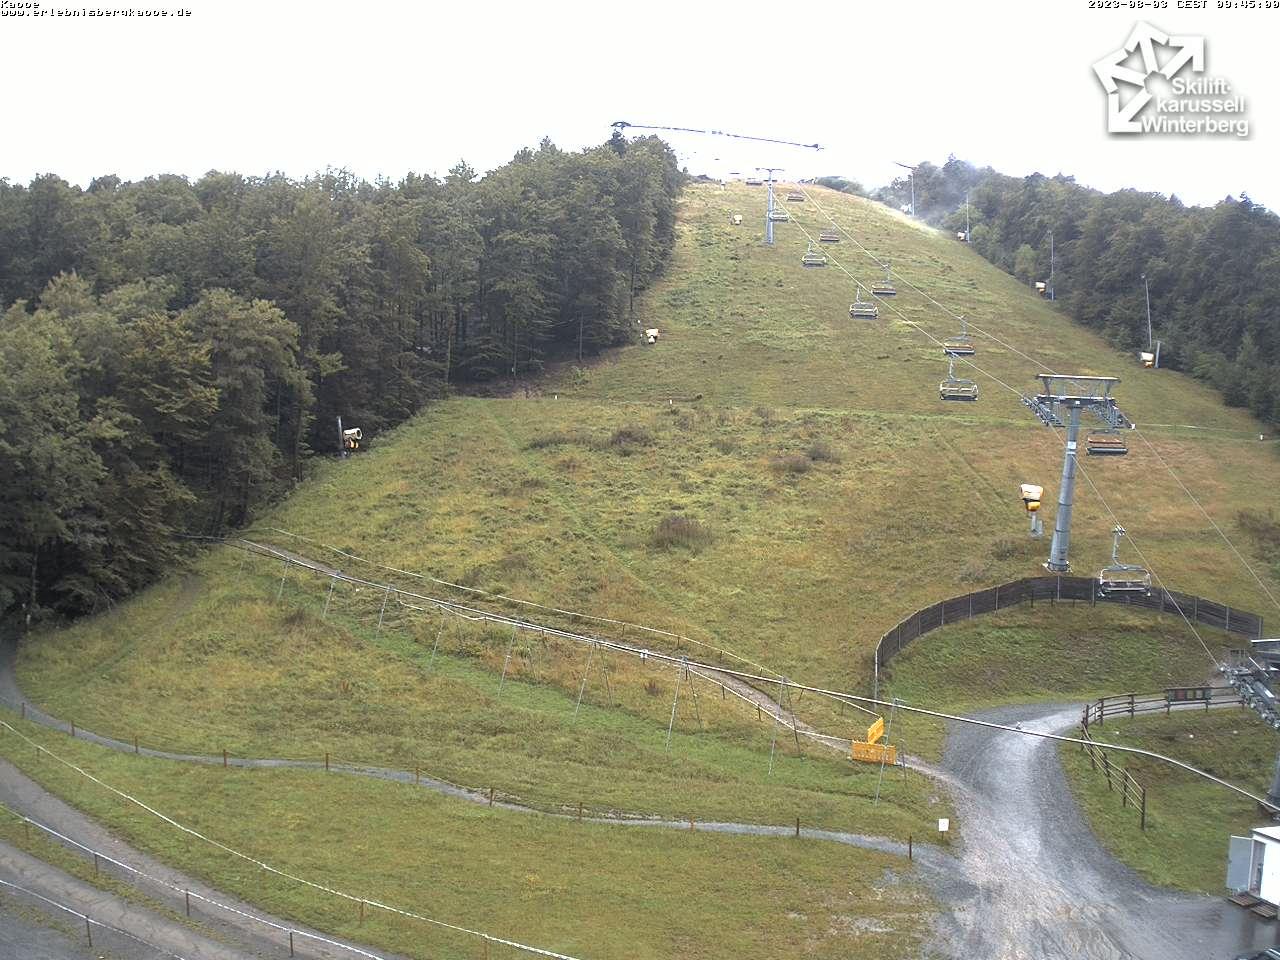 Webcam Slalomhang - Skilifkarussell Winterberg